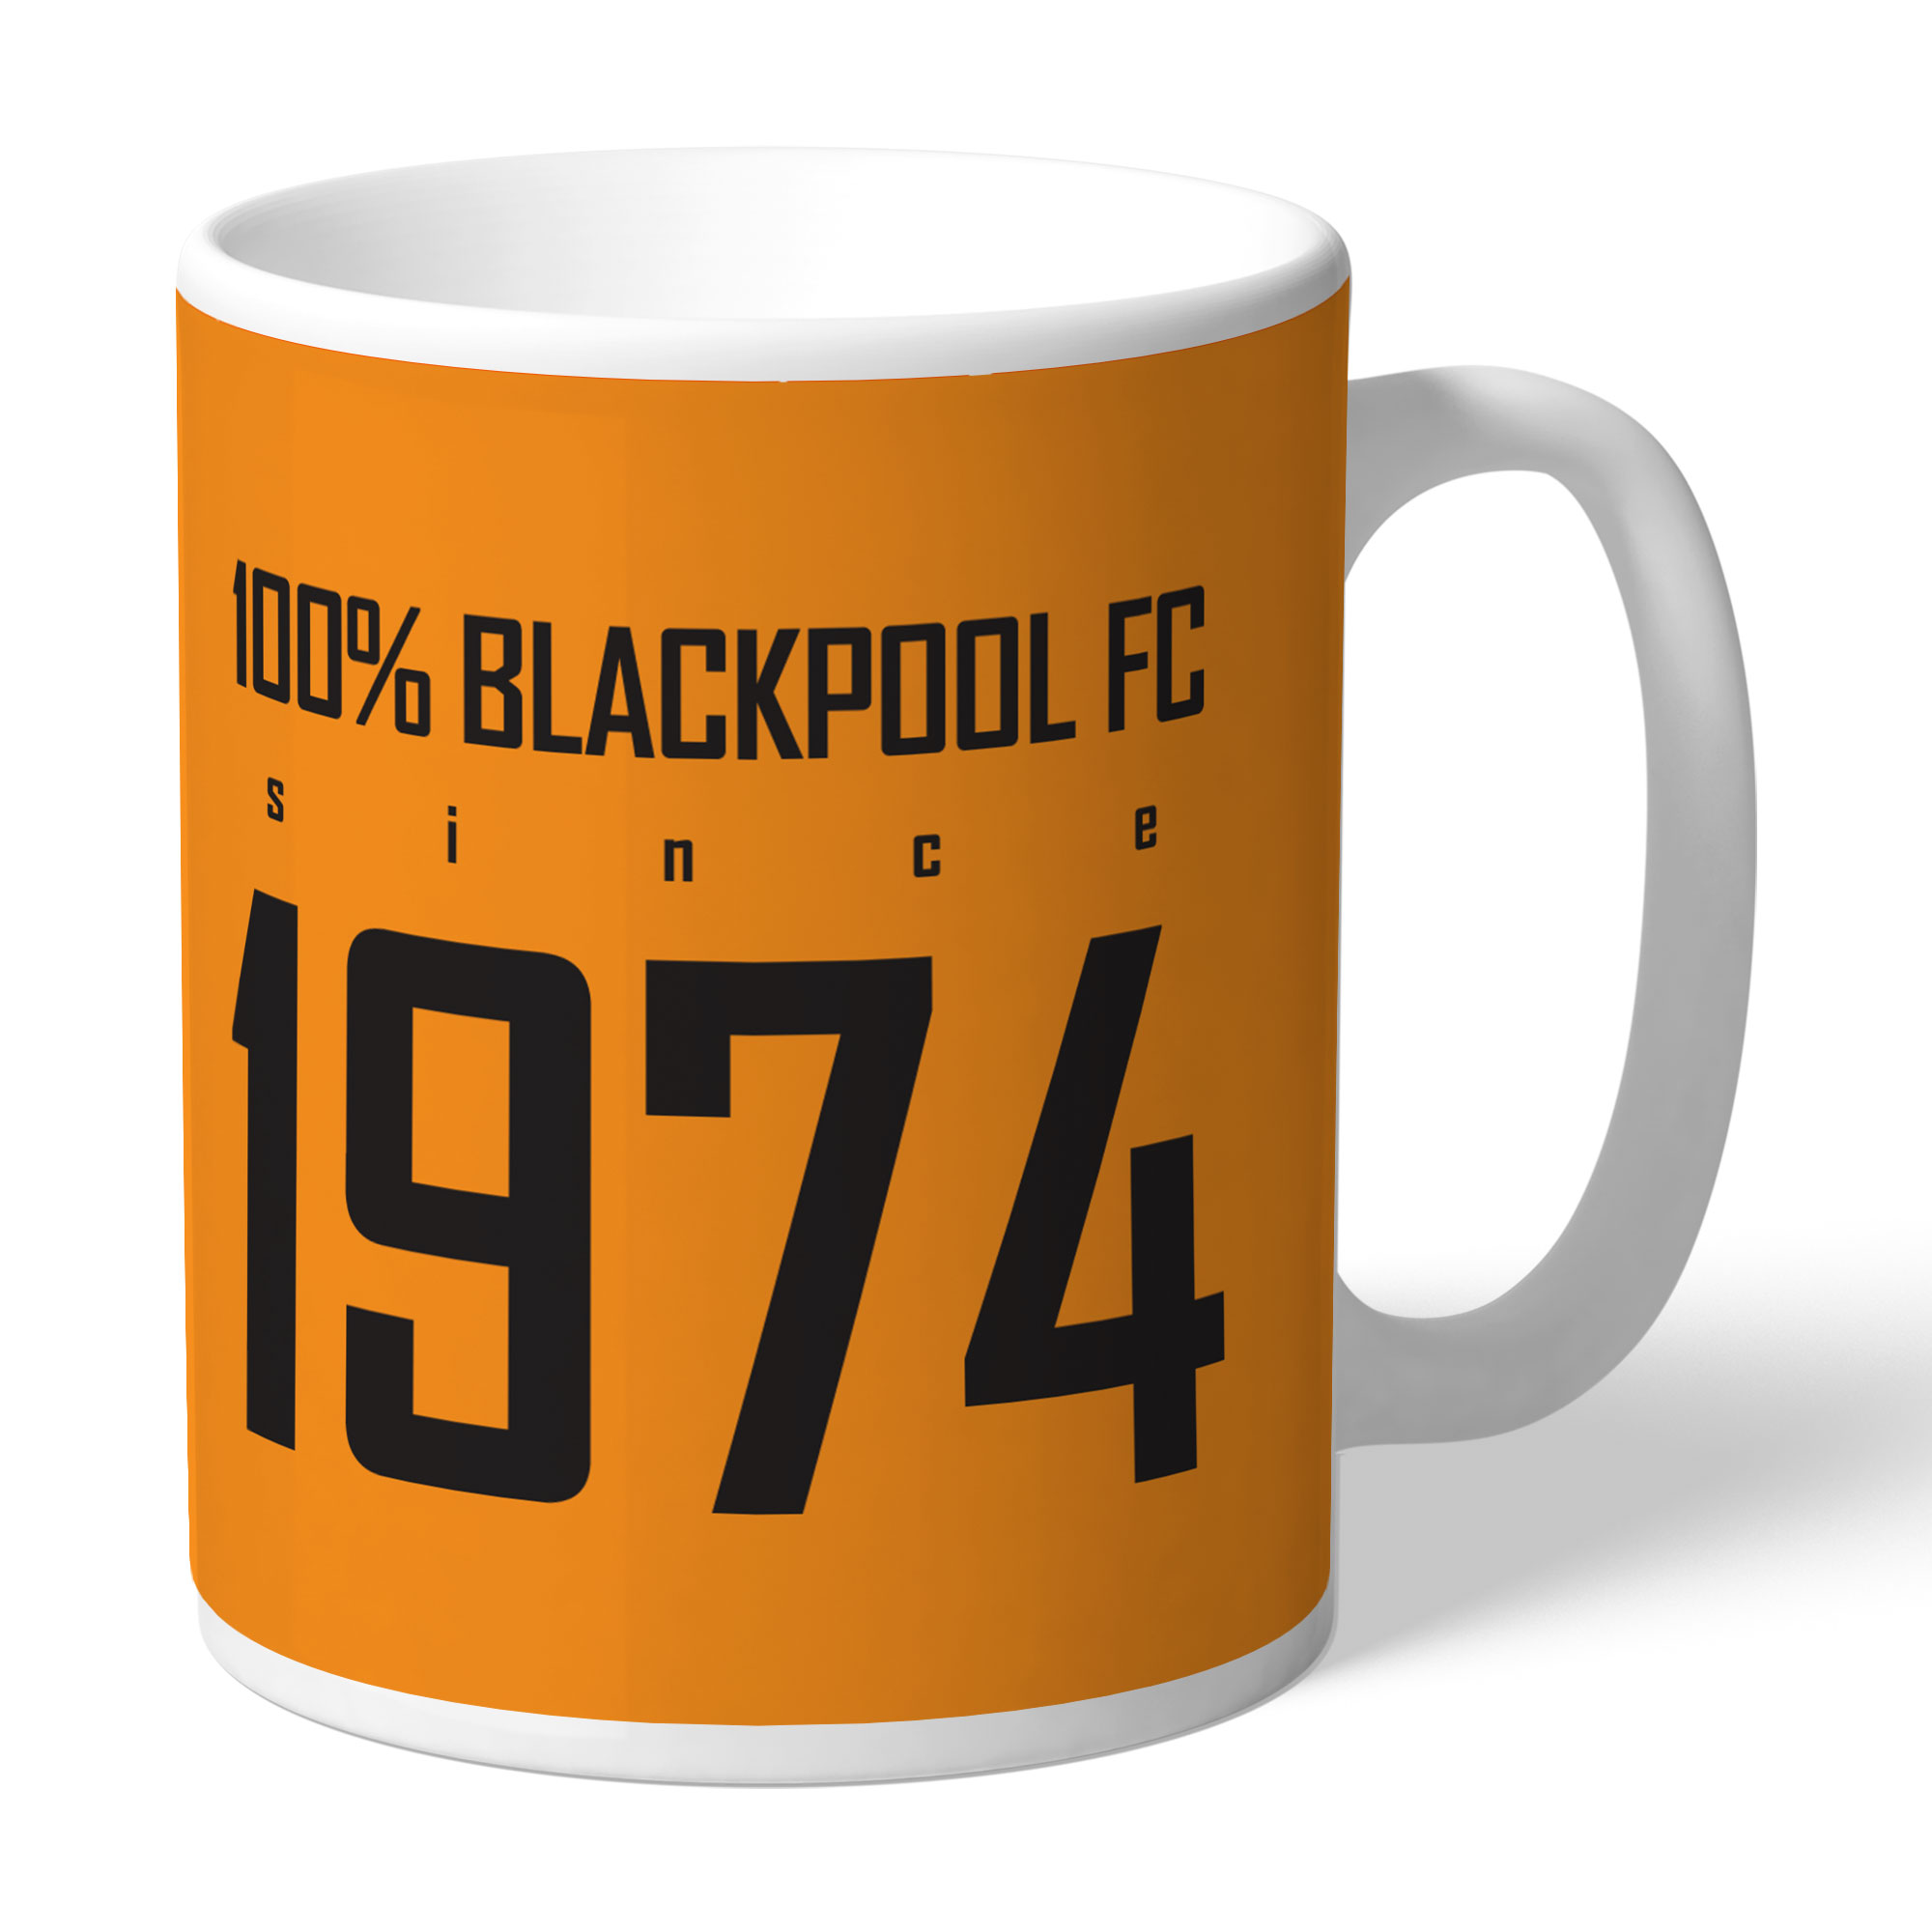 Blackpool FC 100 Percent Mug